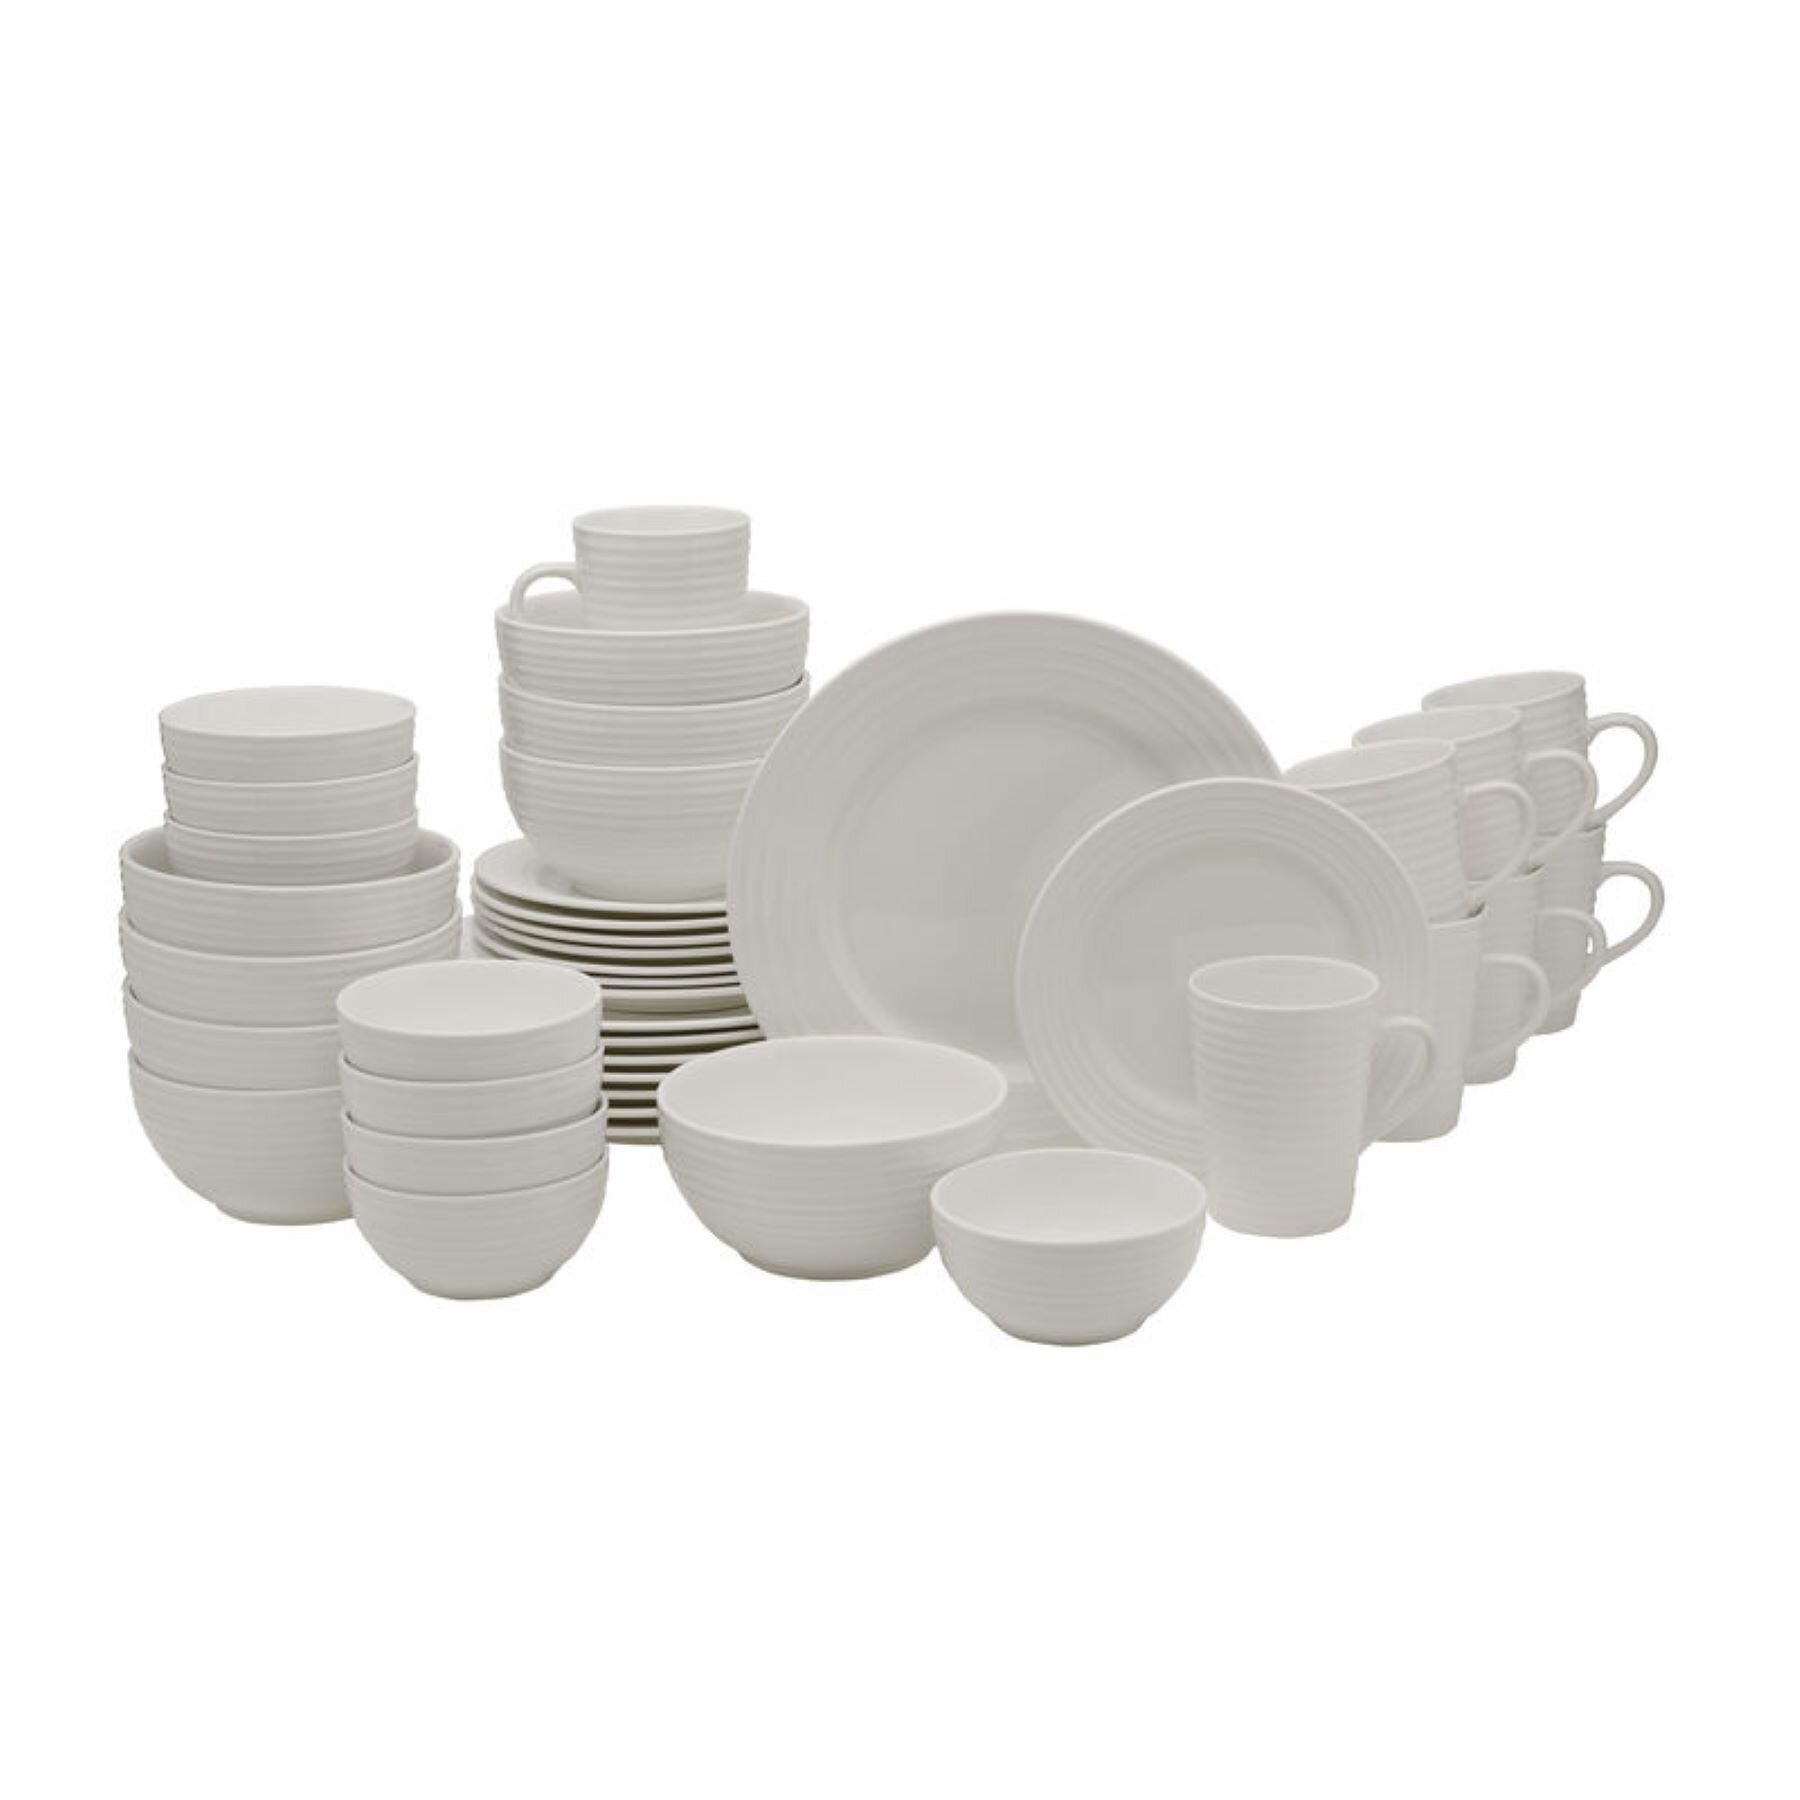 Gourmet Basics By Mikasa Spiral 40 Piece Dinnerware Set Service For 8 Reviews